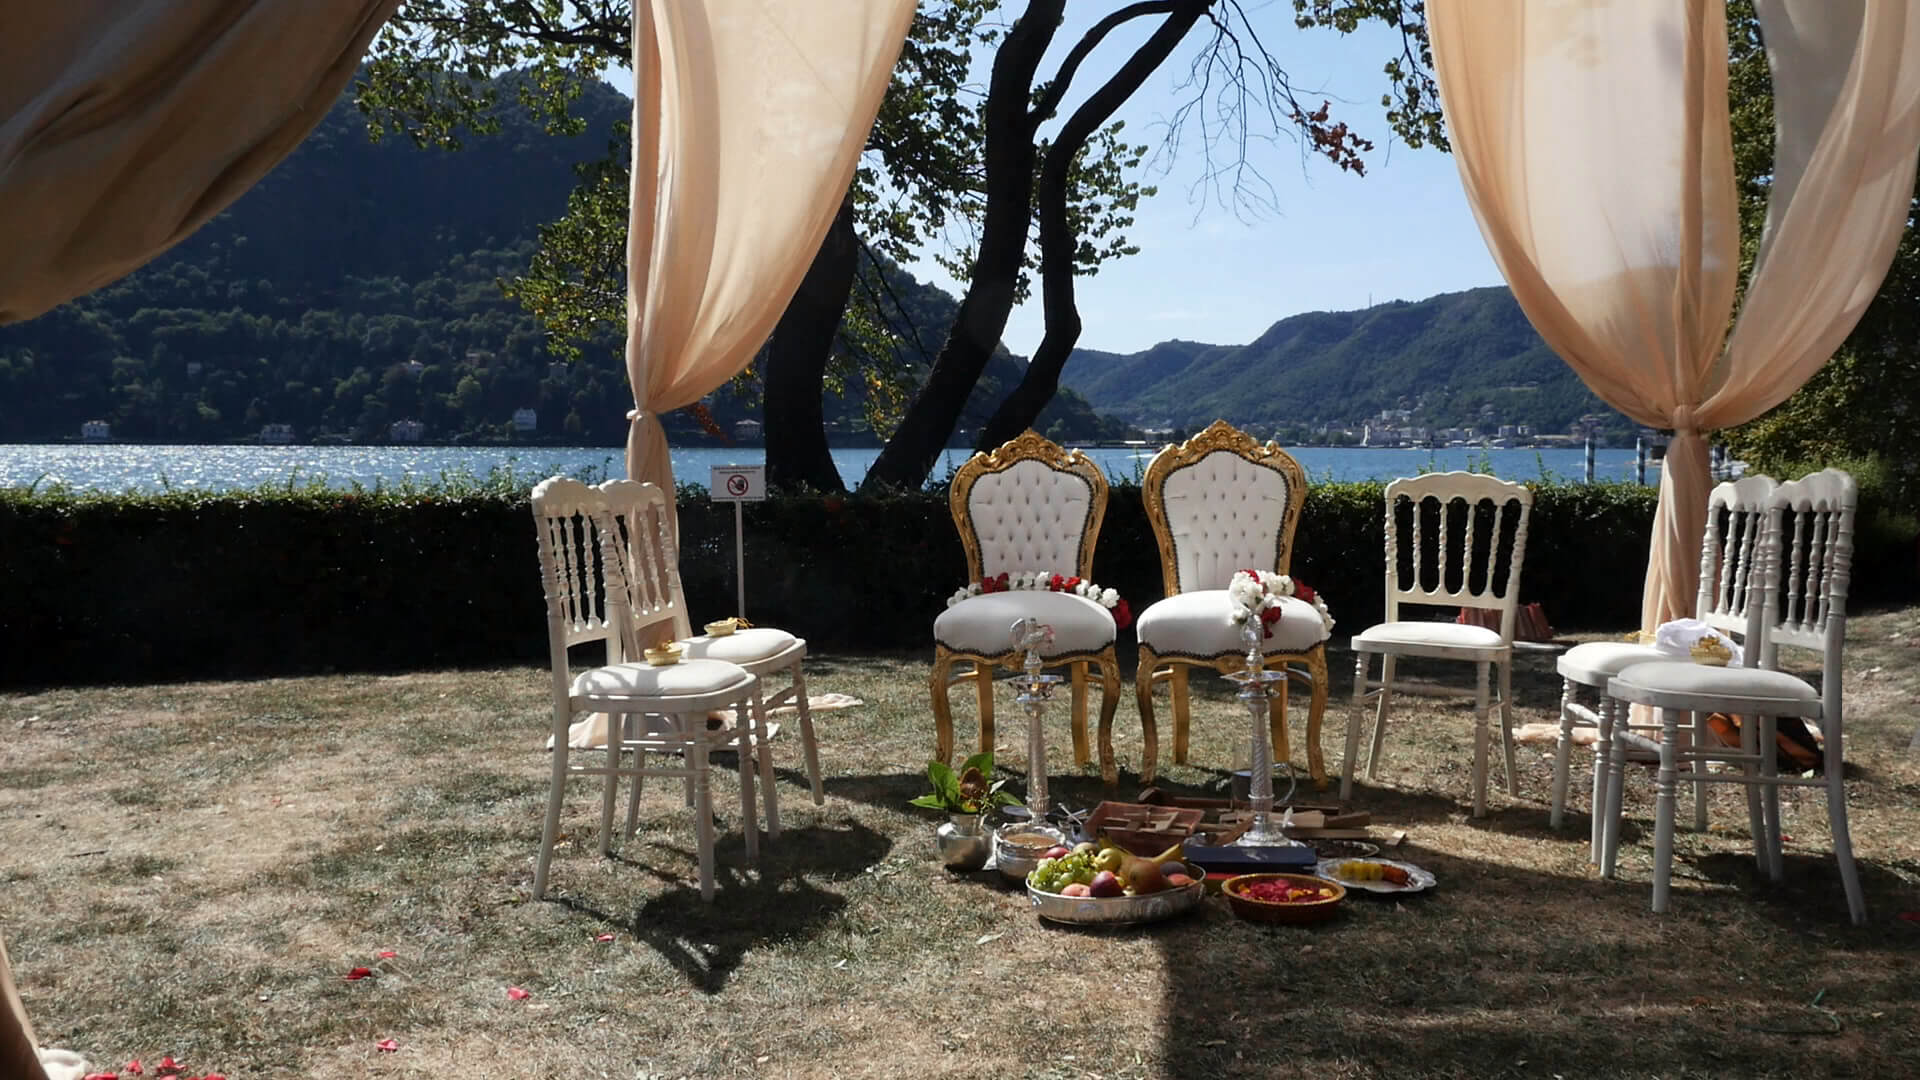 indian-wedding-como-lake-villa-erba-flowers.jpg